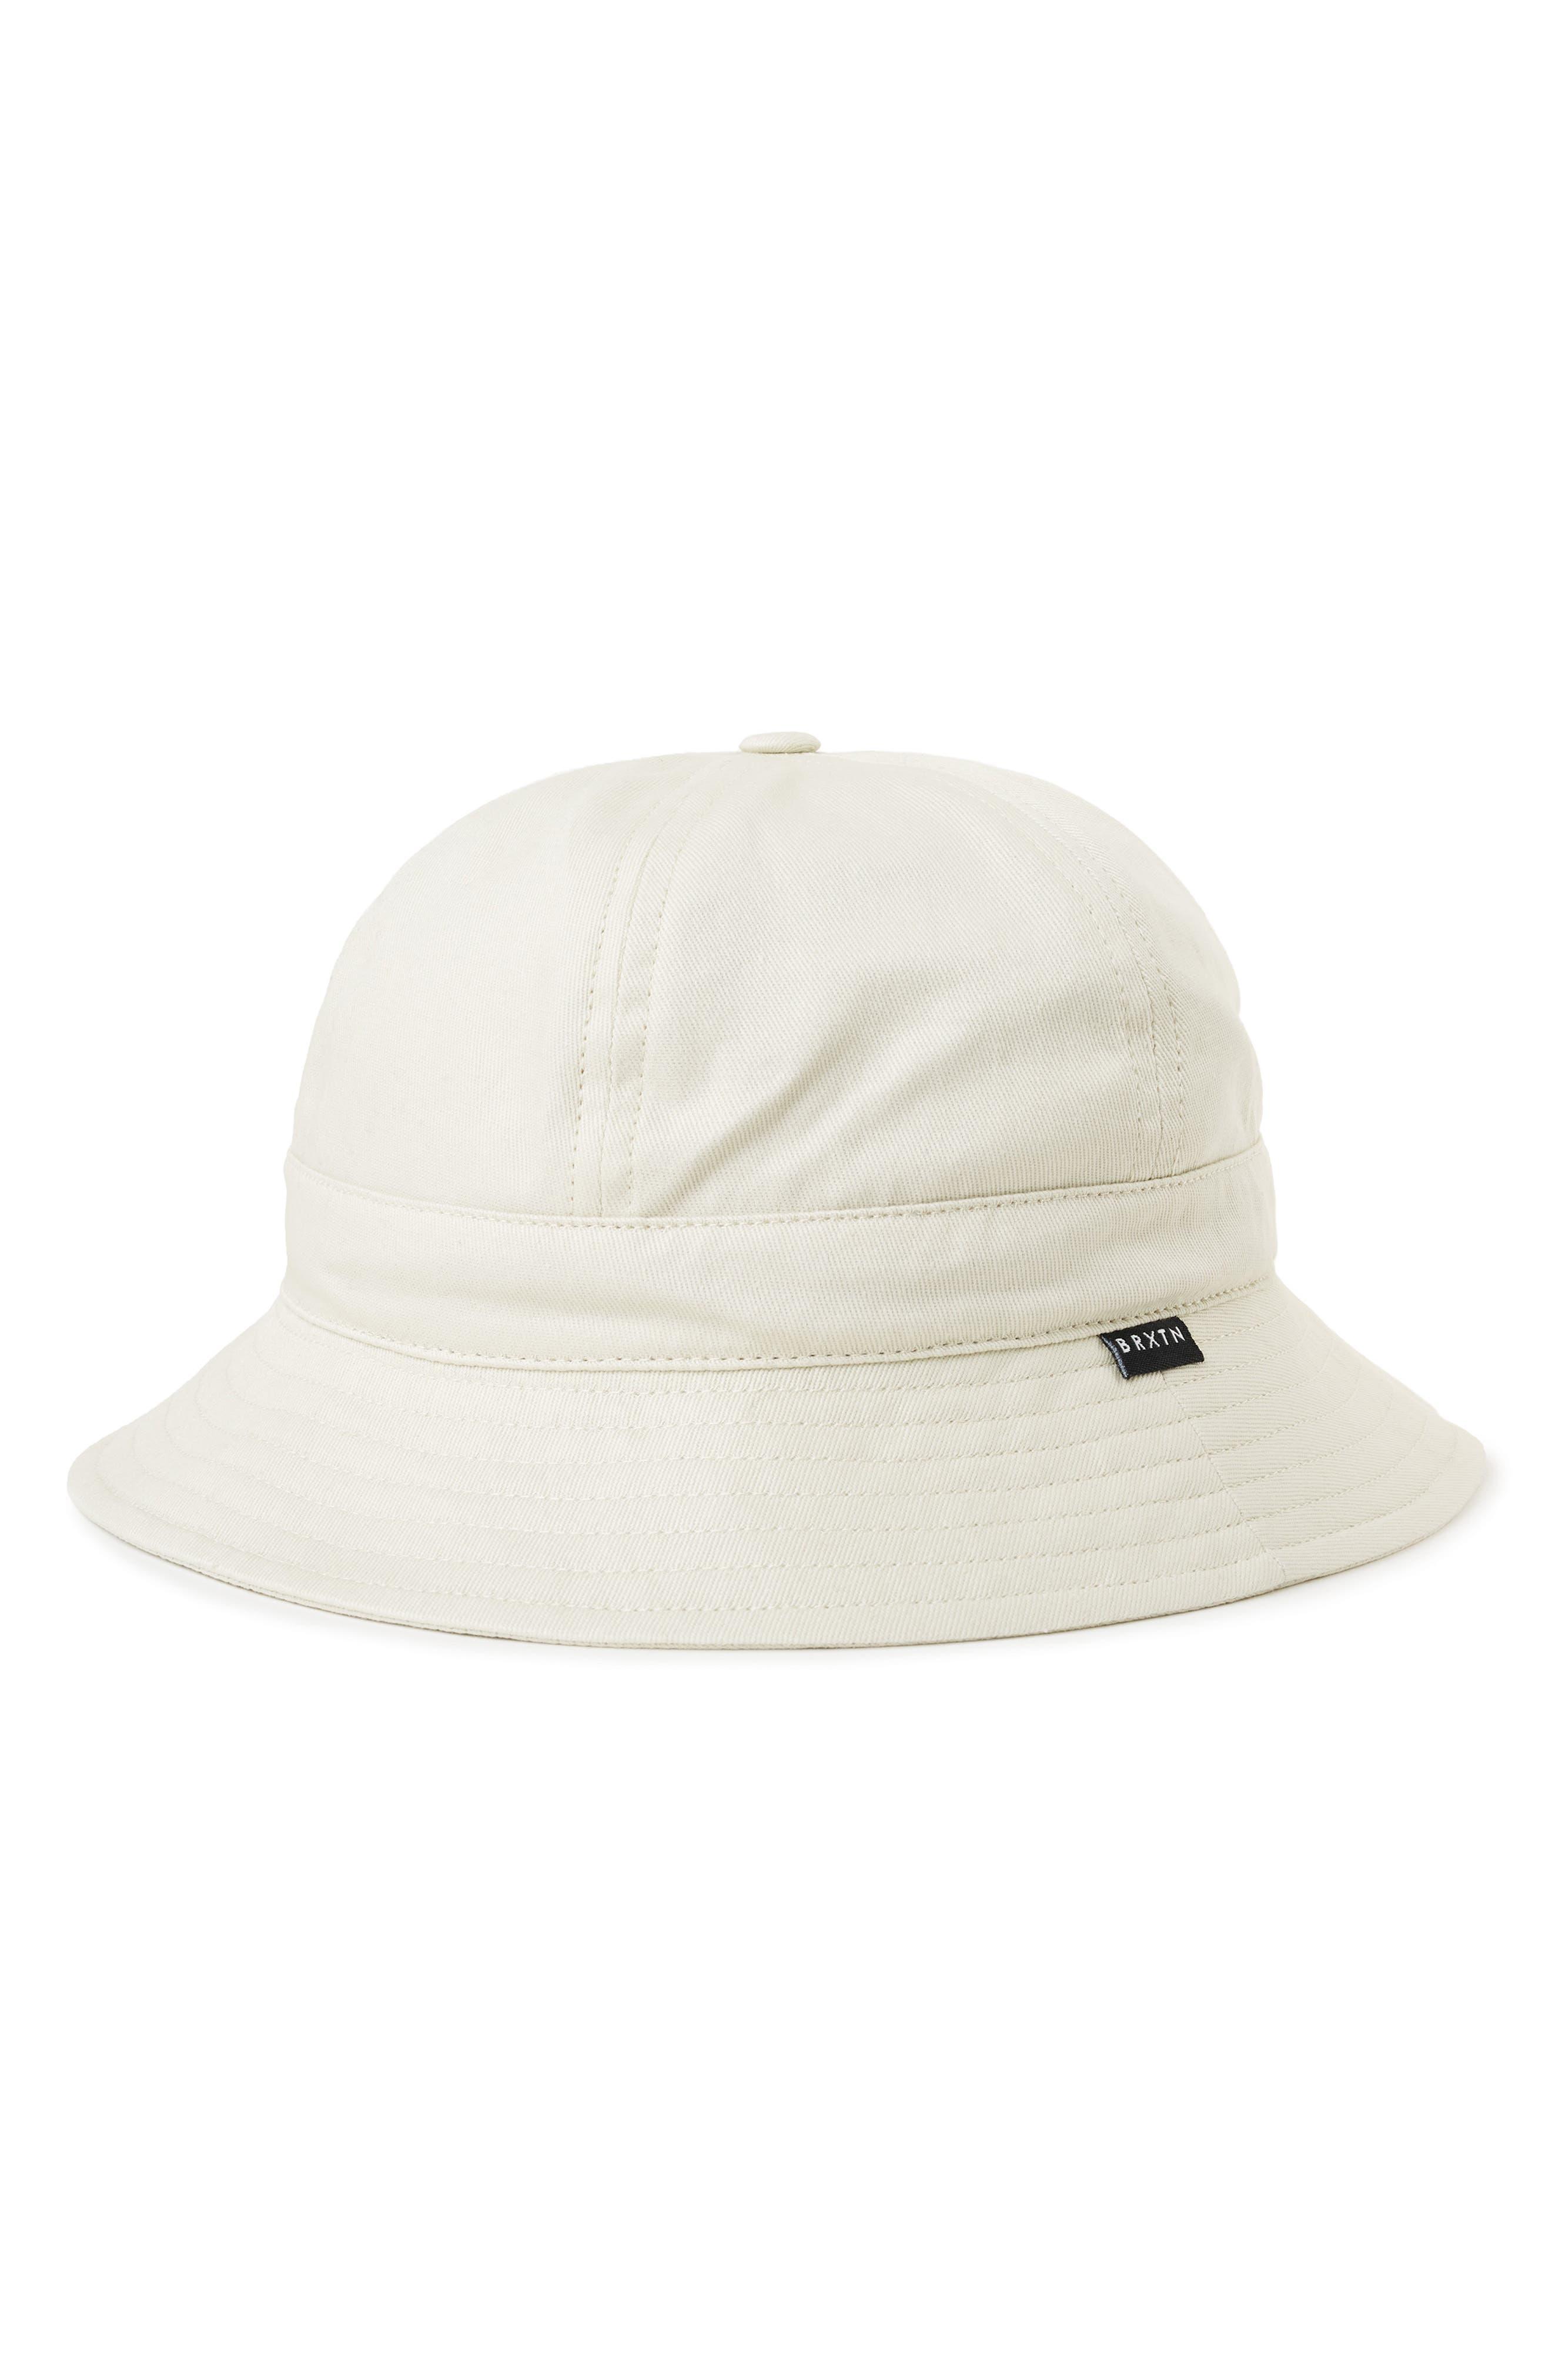 super popular 3aa5e 6607e ... free shipping brixton banks ii bucket hat a1f8a 82c00